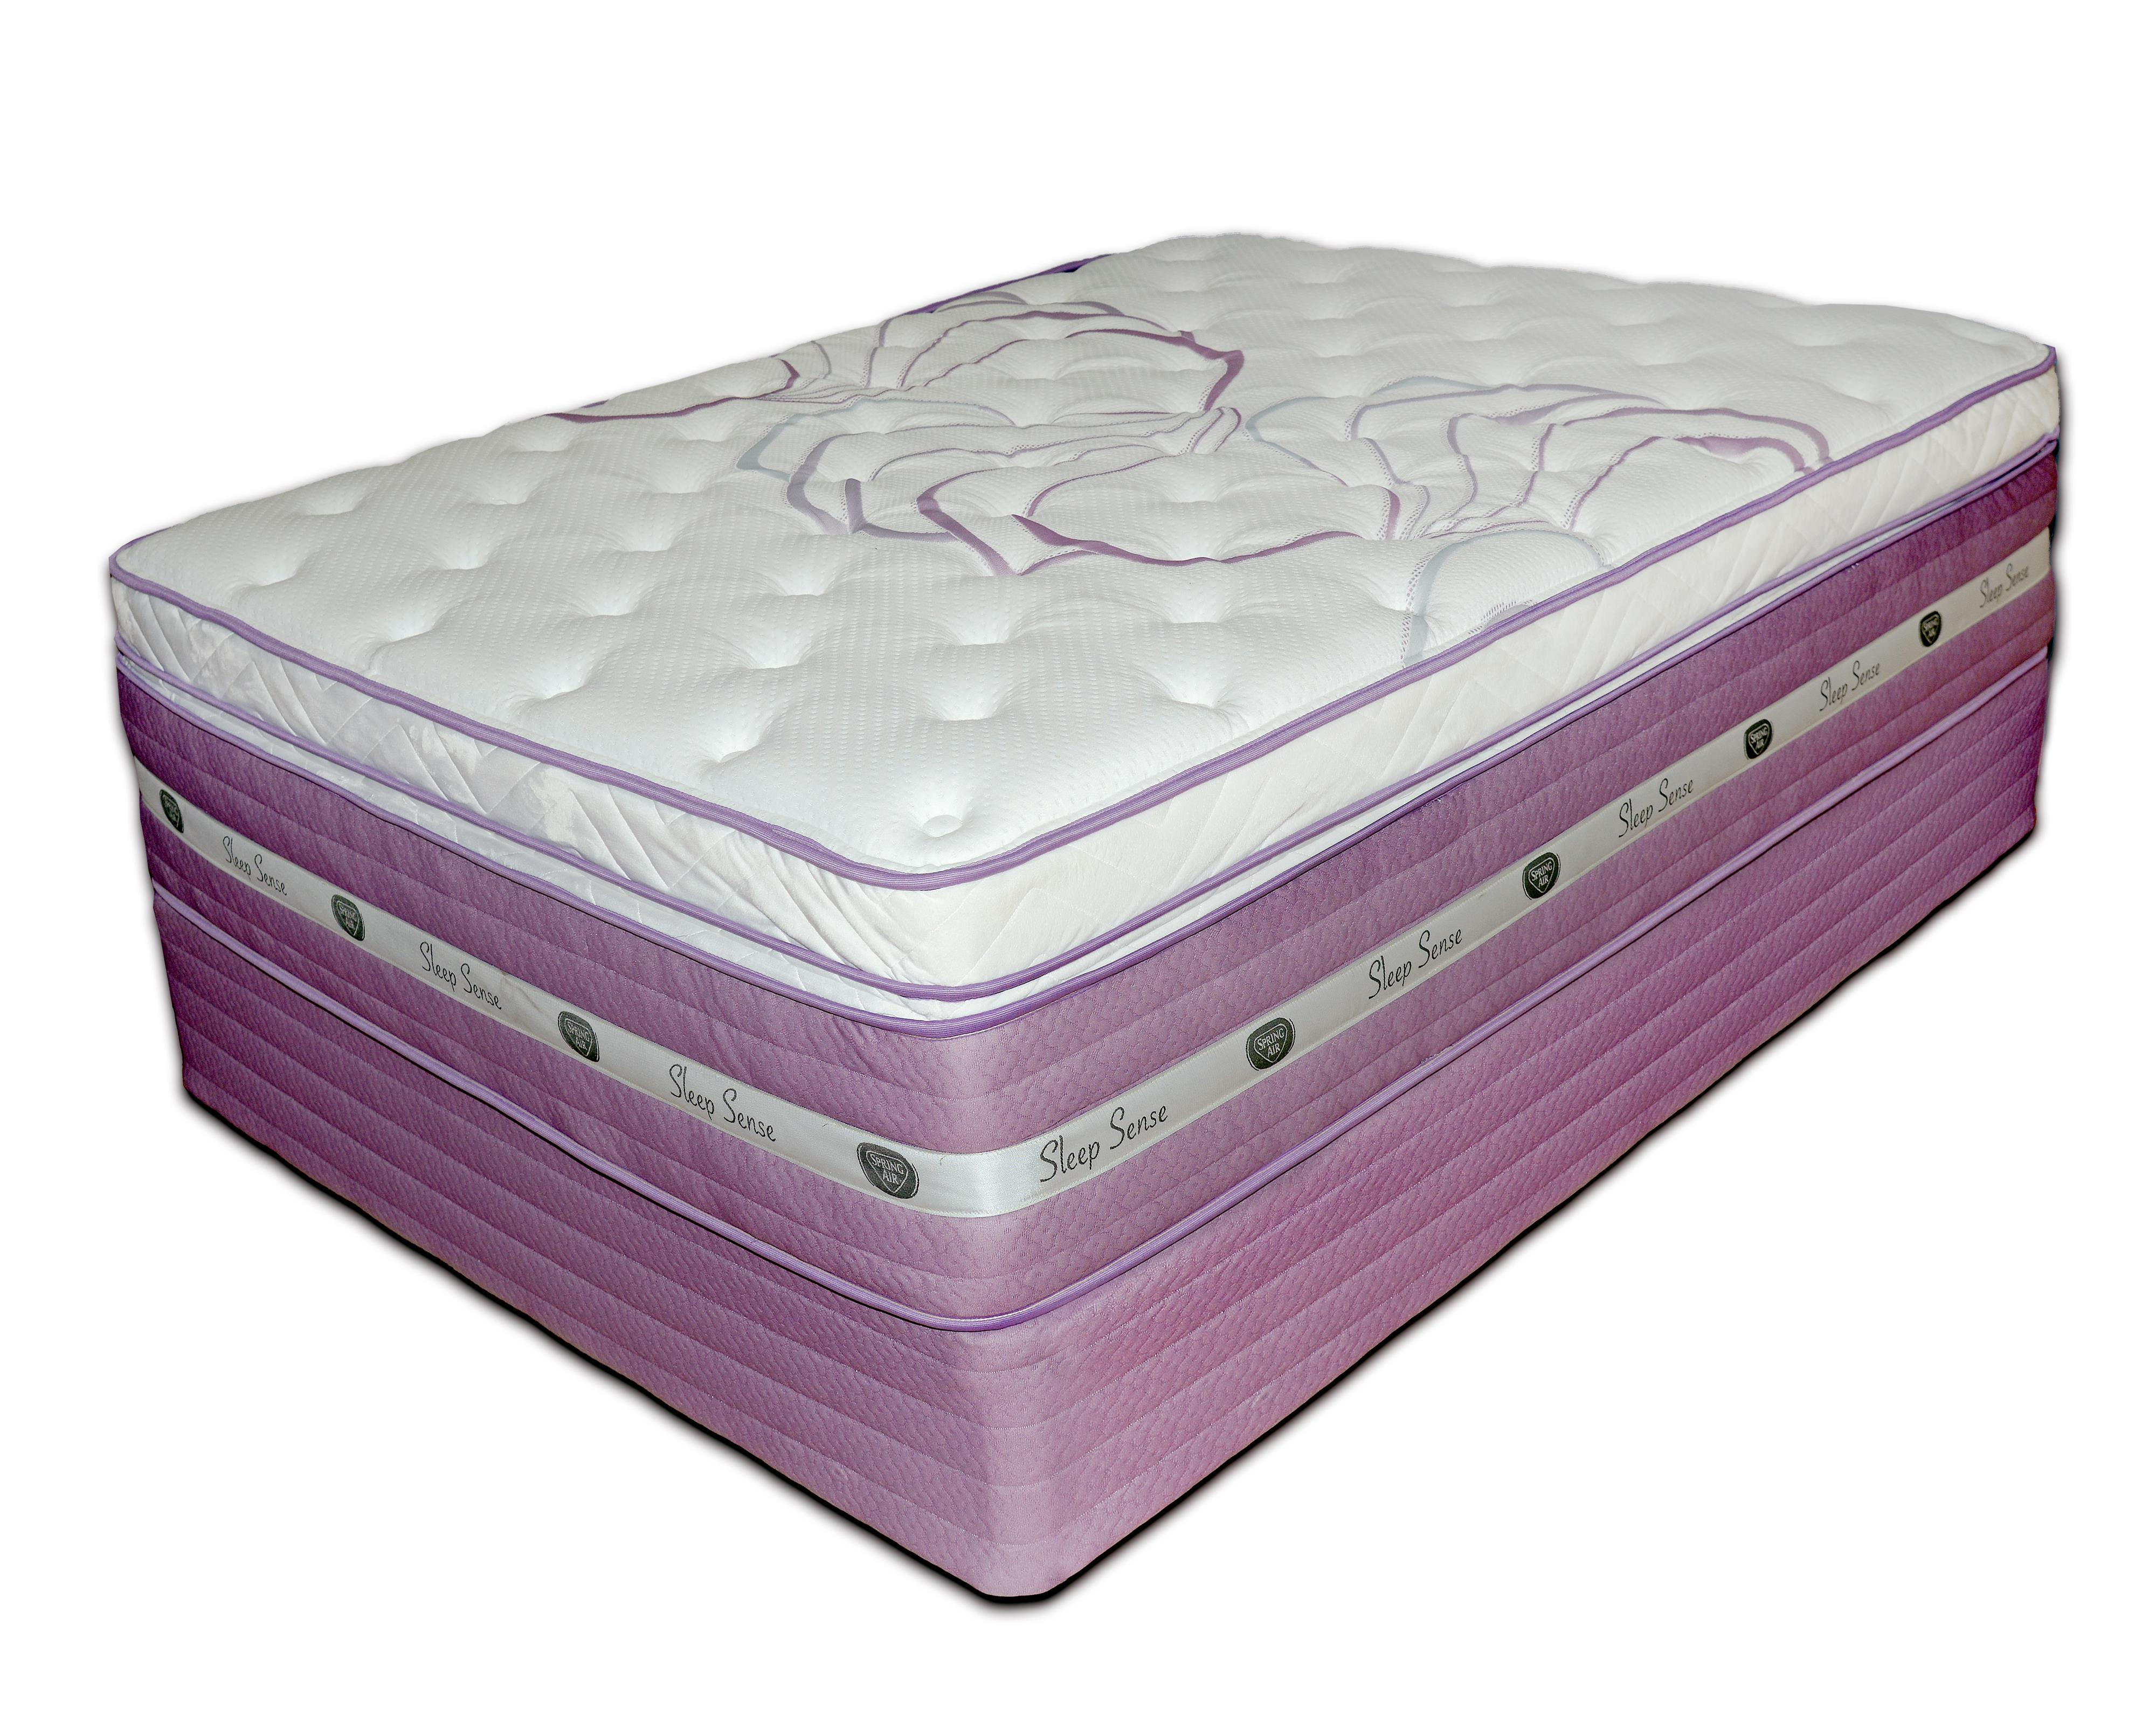 "Sleep Sense Purple Full 16"" Hybrid Box Top Mattress by Spring Air at Mueller Furniture"